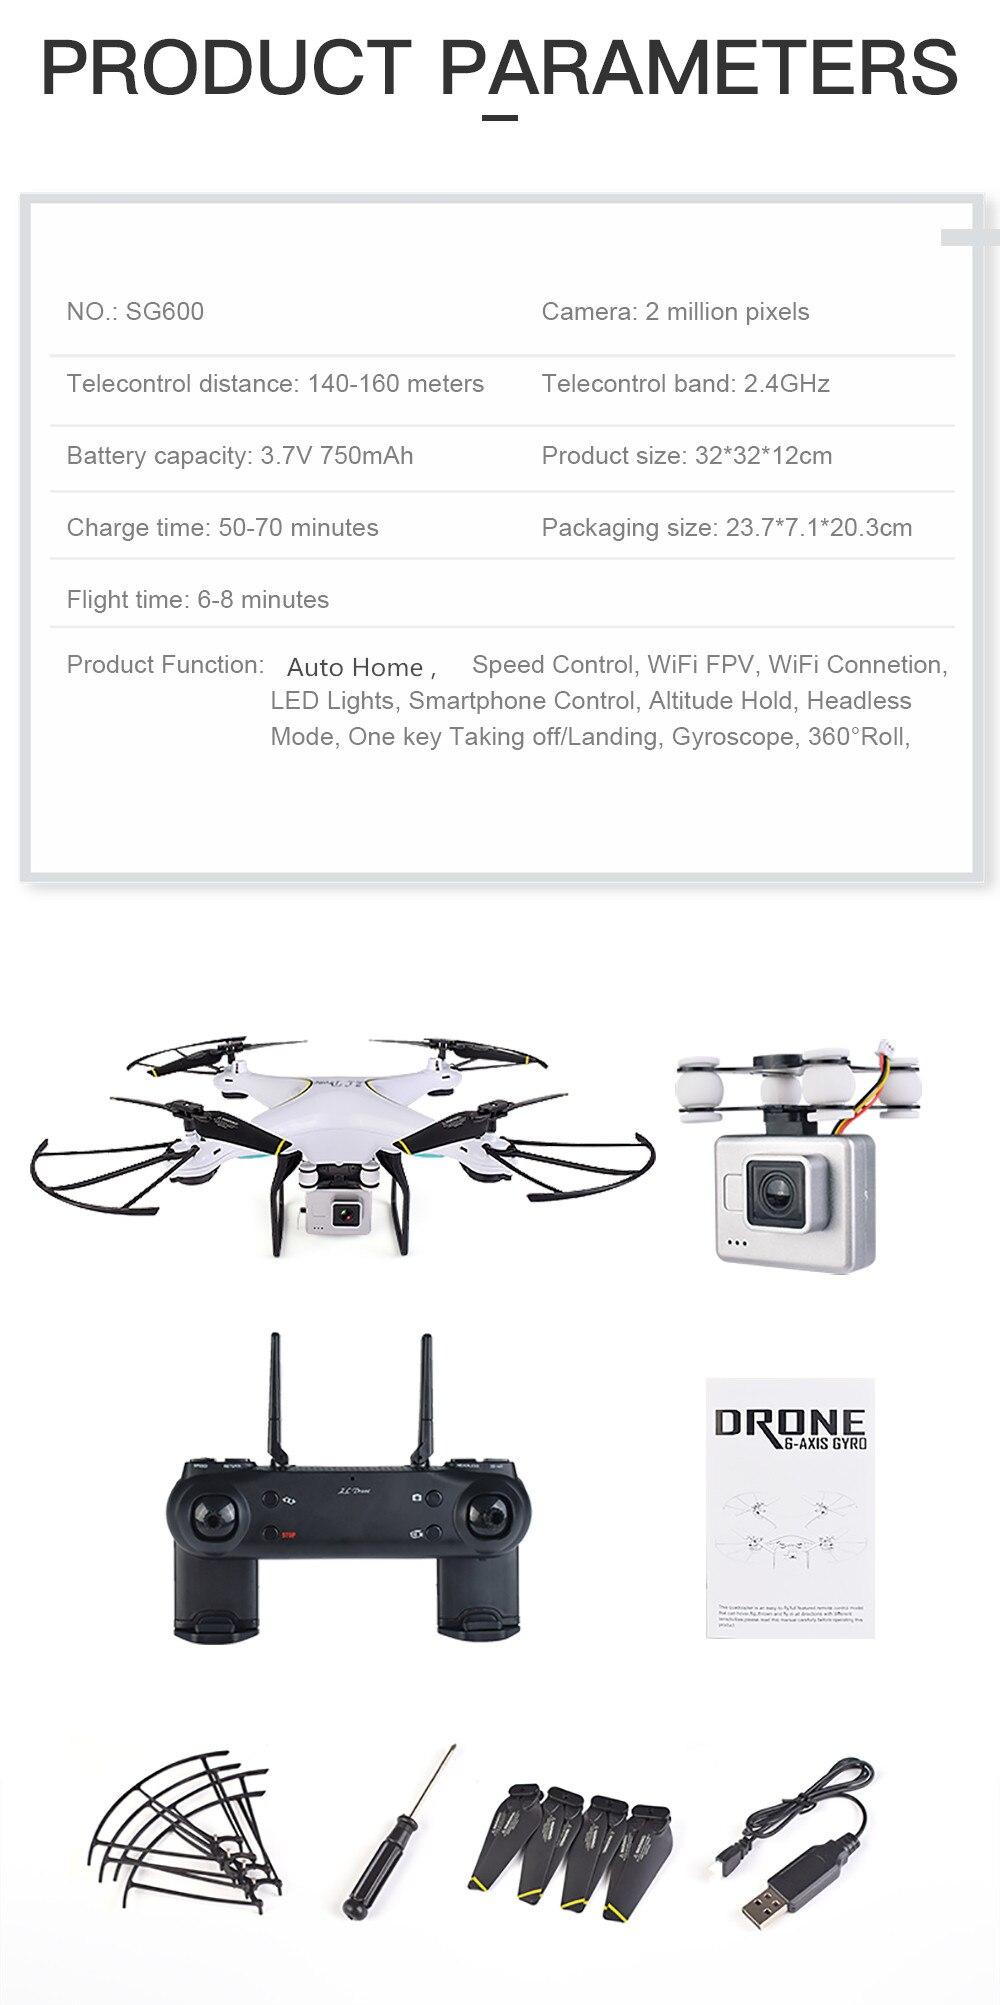 Sg600 Rc Drone With Camera 2mp Wifi Fpv Quadcopter Altitude Hold Bayangtoys X 16 Gps 2 Mega Pixel Putih 1 English Manual